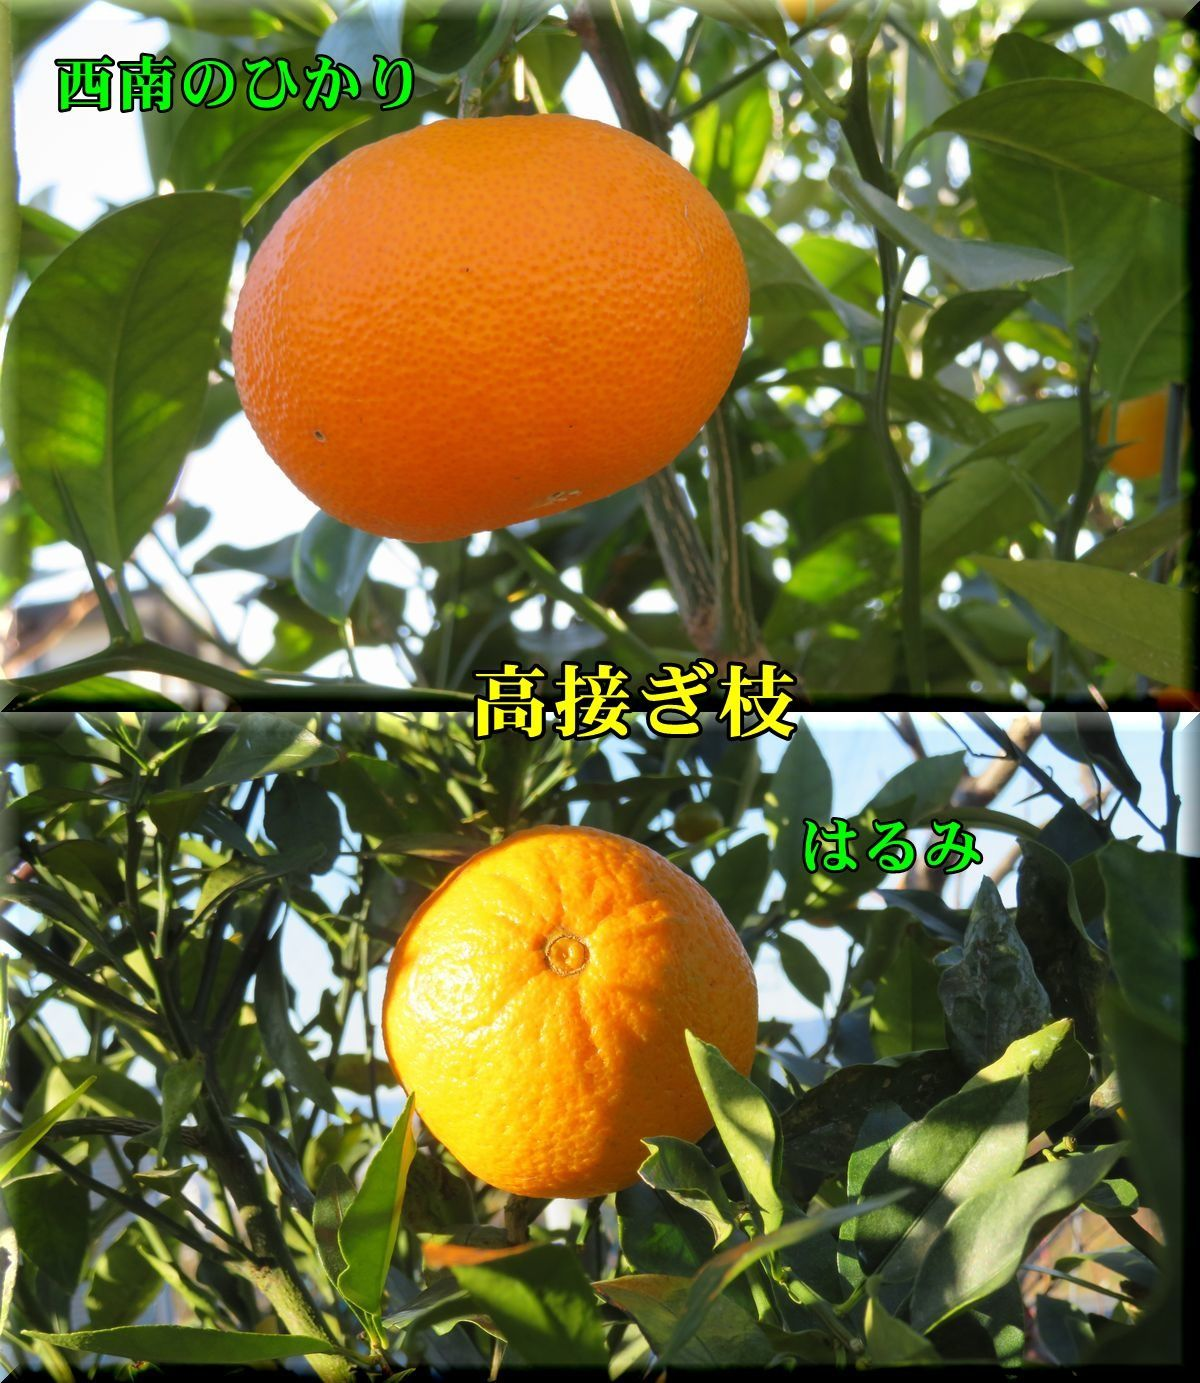 1seinan_harumi171210_004.jpg